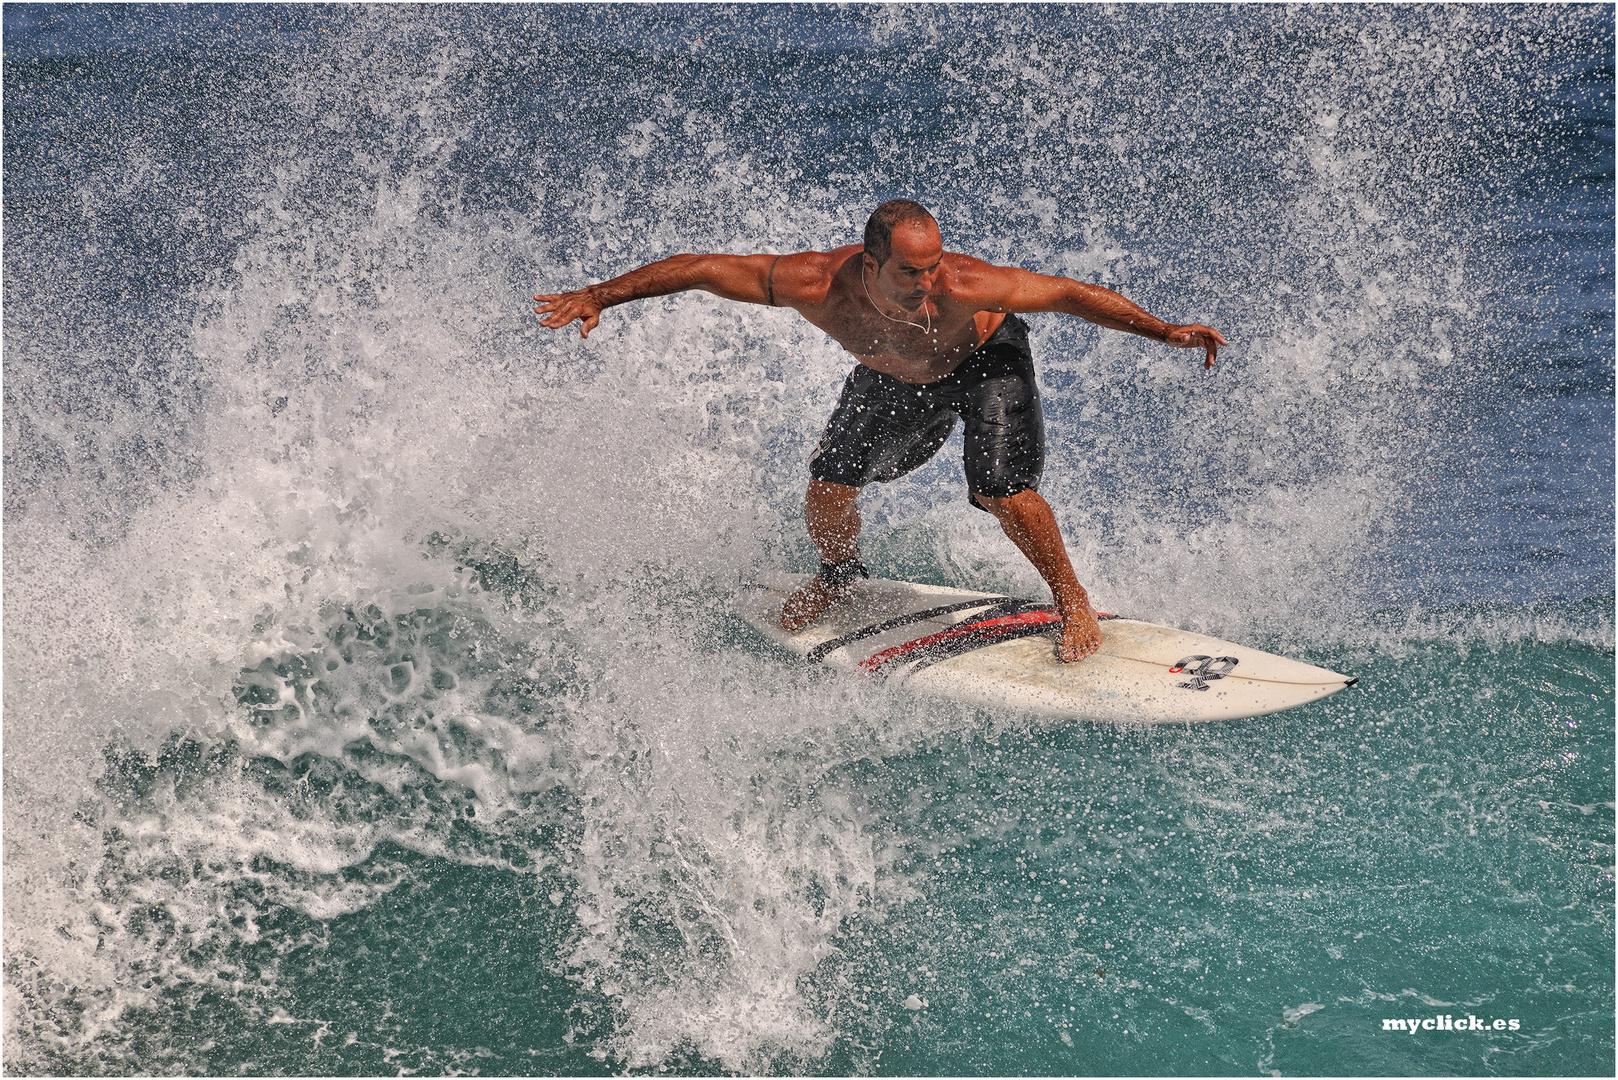 UN VETERANO SURFER LLORET-GRAN CANARIA